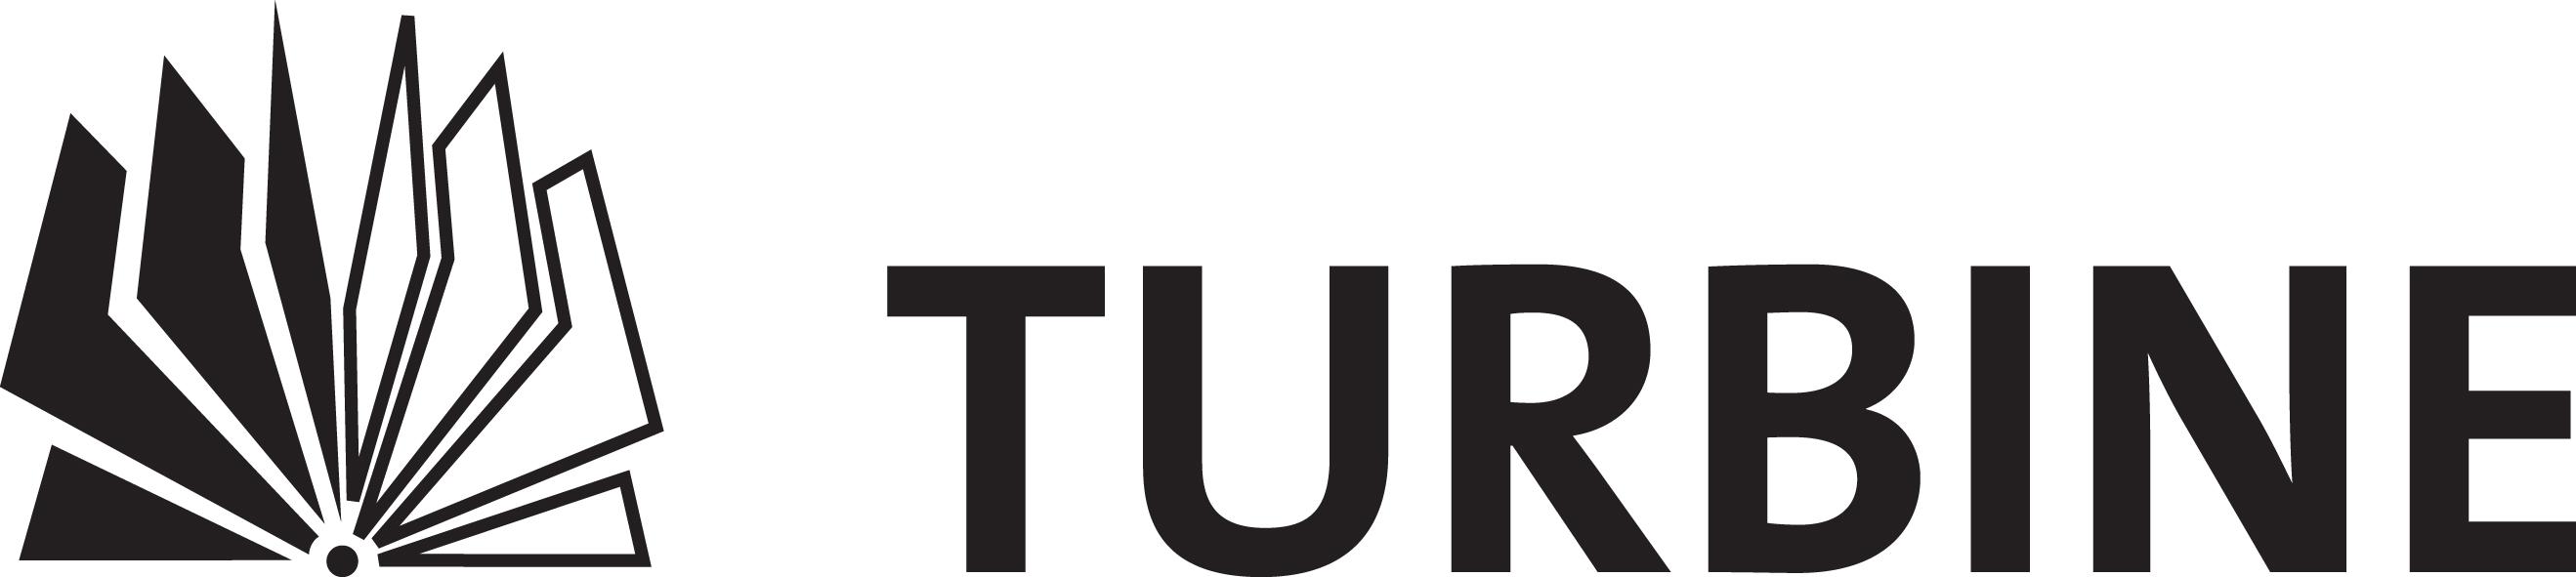 Turbine Forlaget A/S